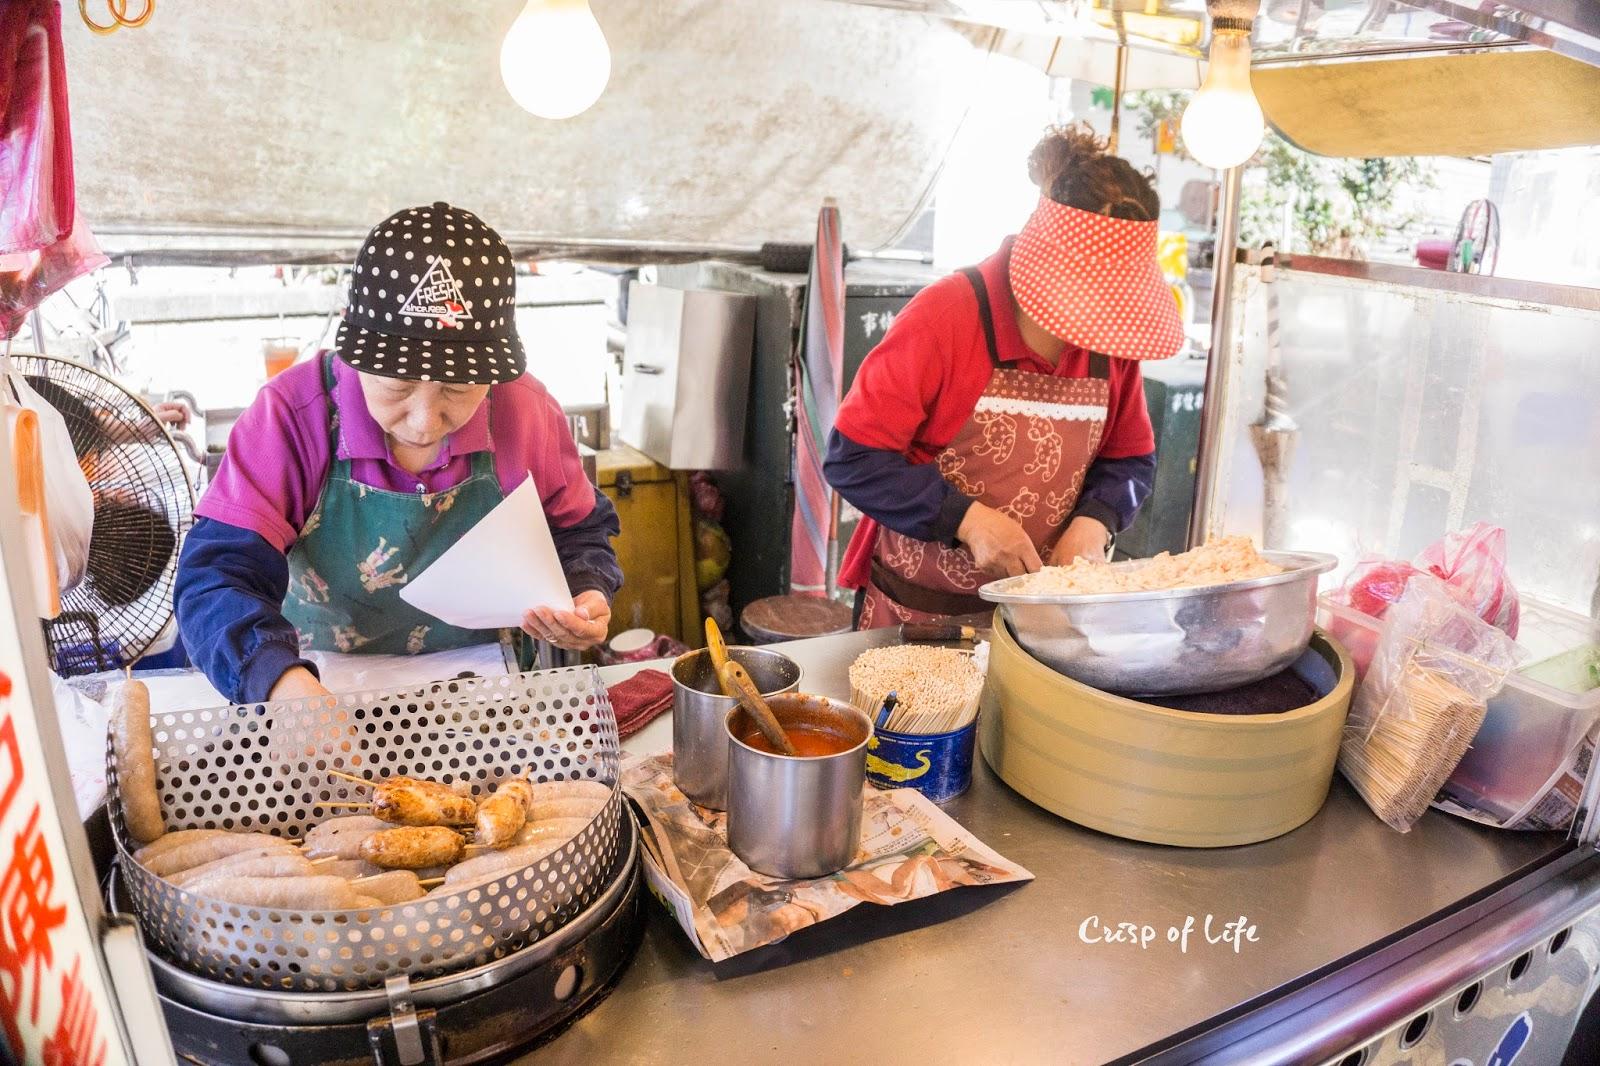 [TAIPEI 台北] Day 4: Travel to Shi Fen and Jiu Fen, Rui Fang Food Street 第四天:九份和十份,瑞芳美食街